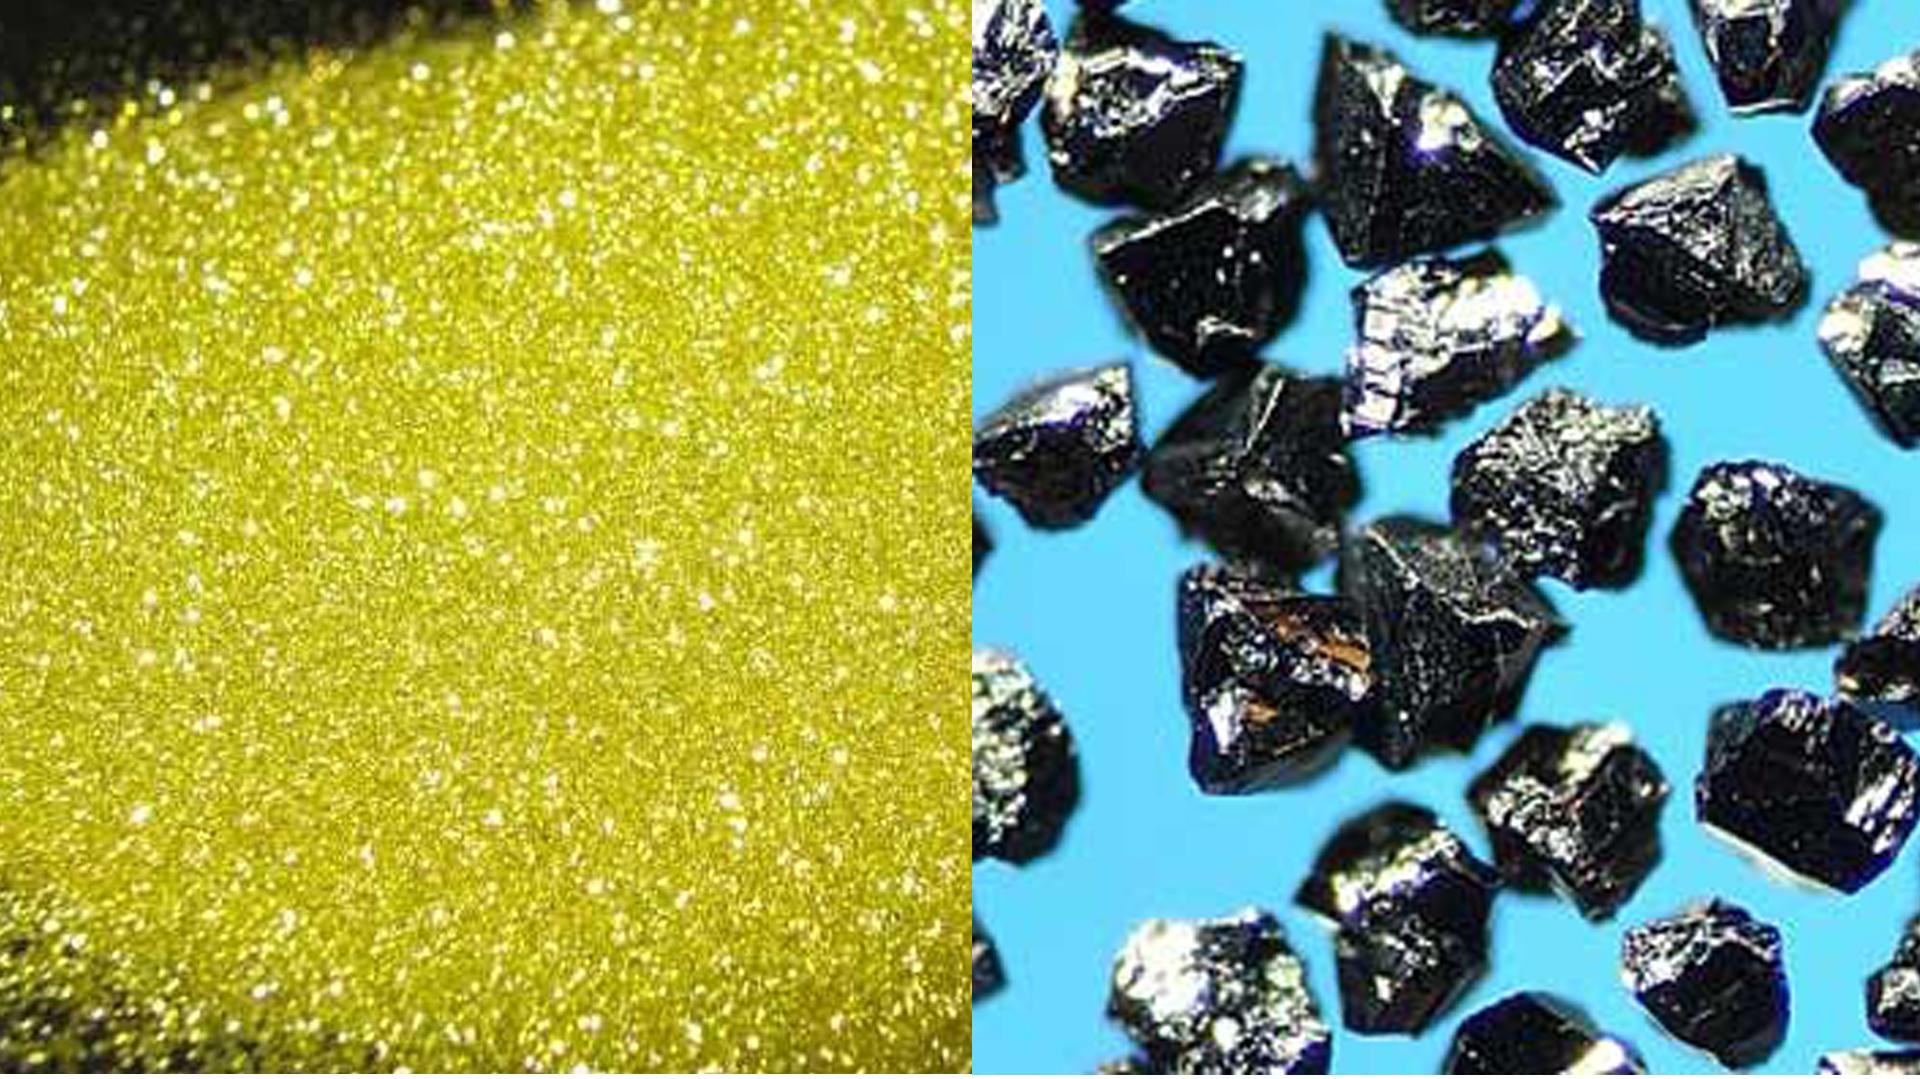 diamond and CBN abrasive grain